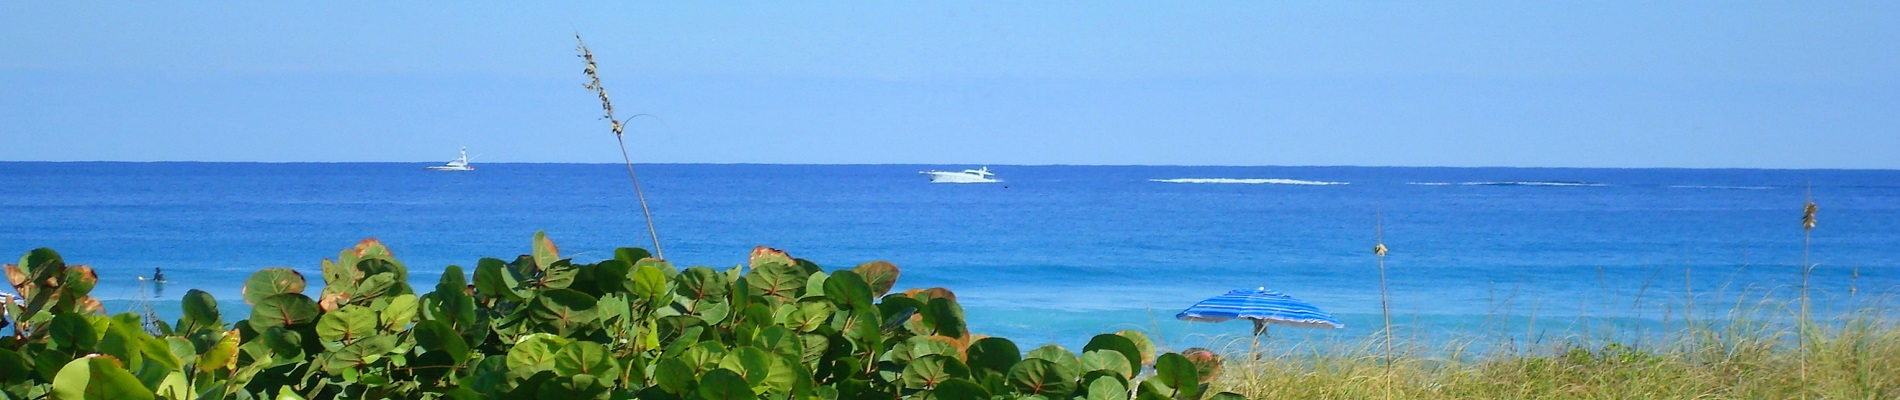 Luxury Resort Portfolio - Palm Beach County Oceanfront Estates For Sale